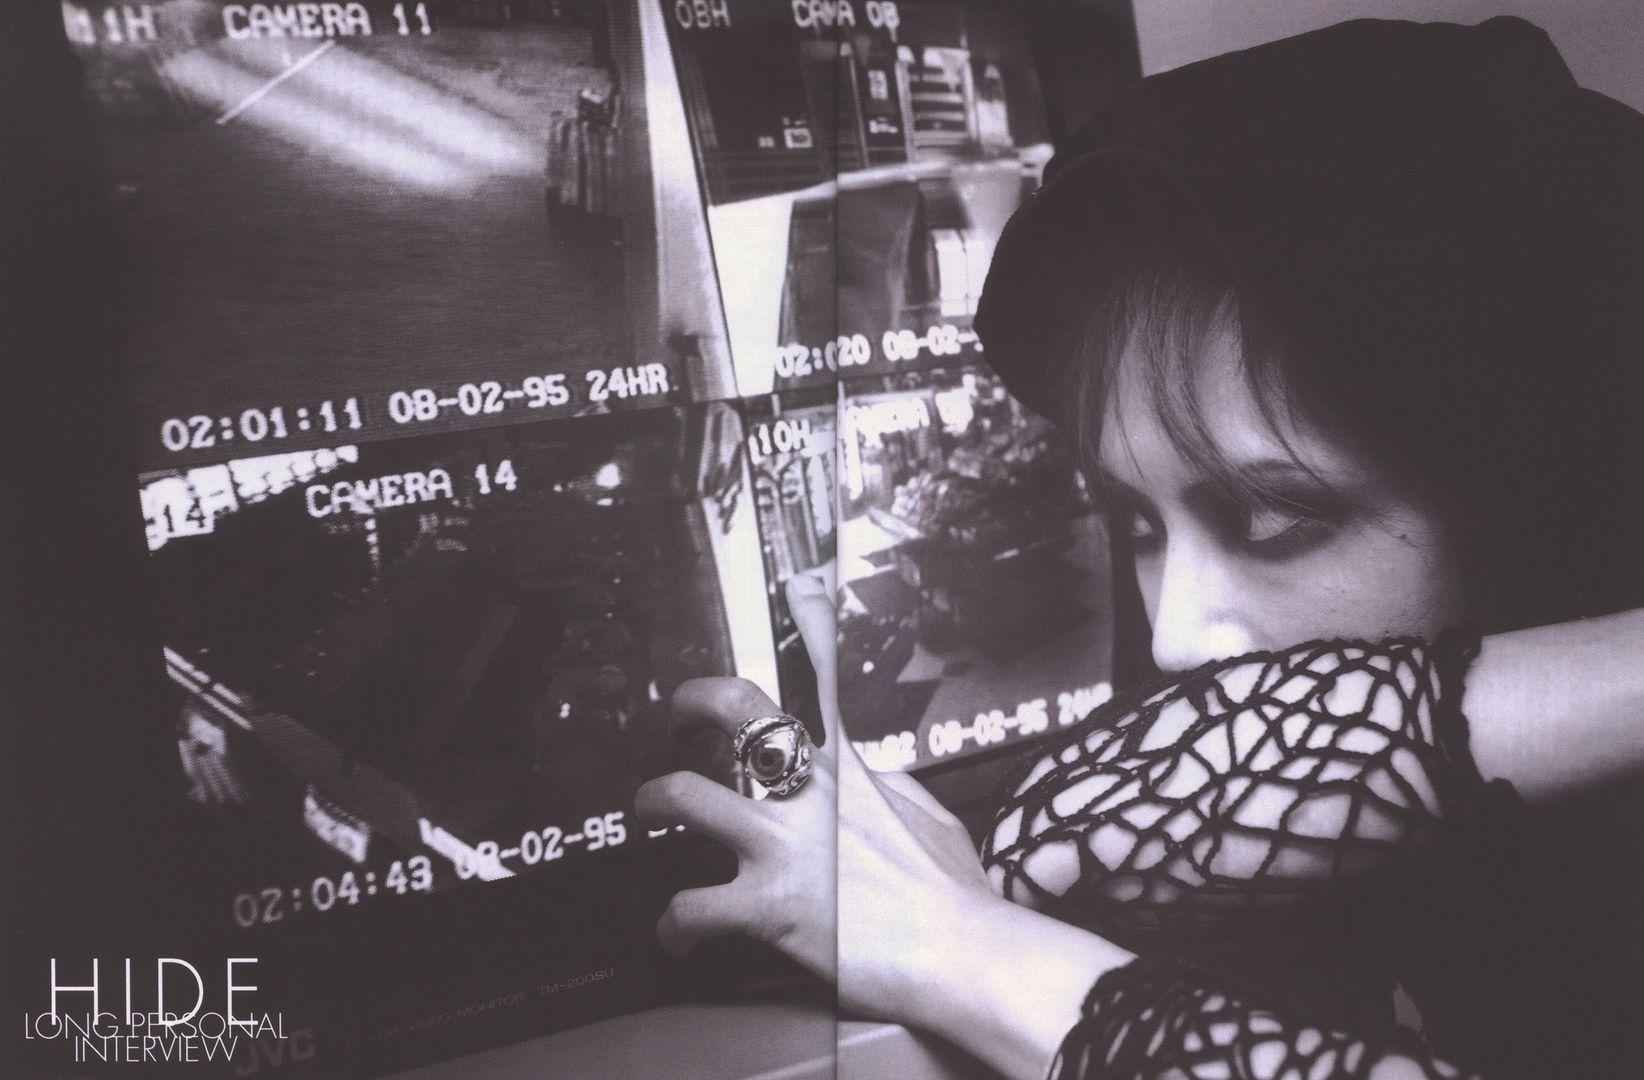 Hide X Japan - Страница 2 Fm171-hide-9